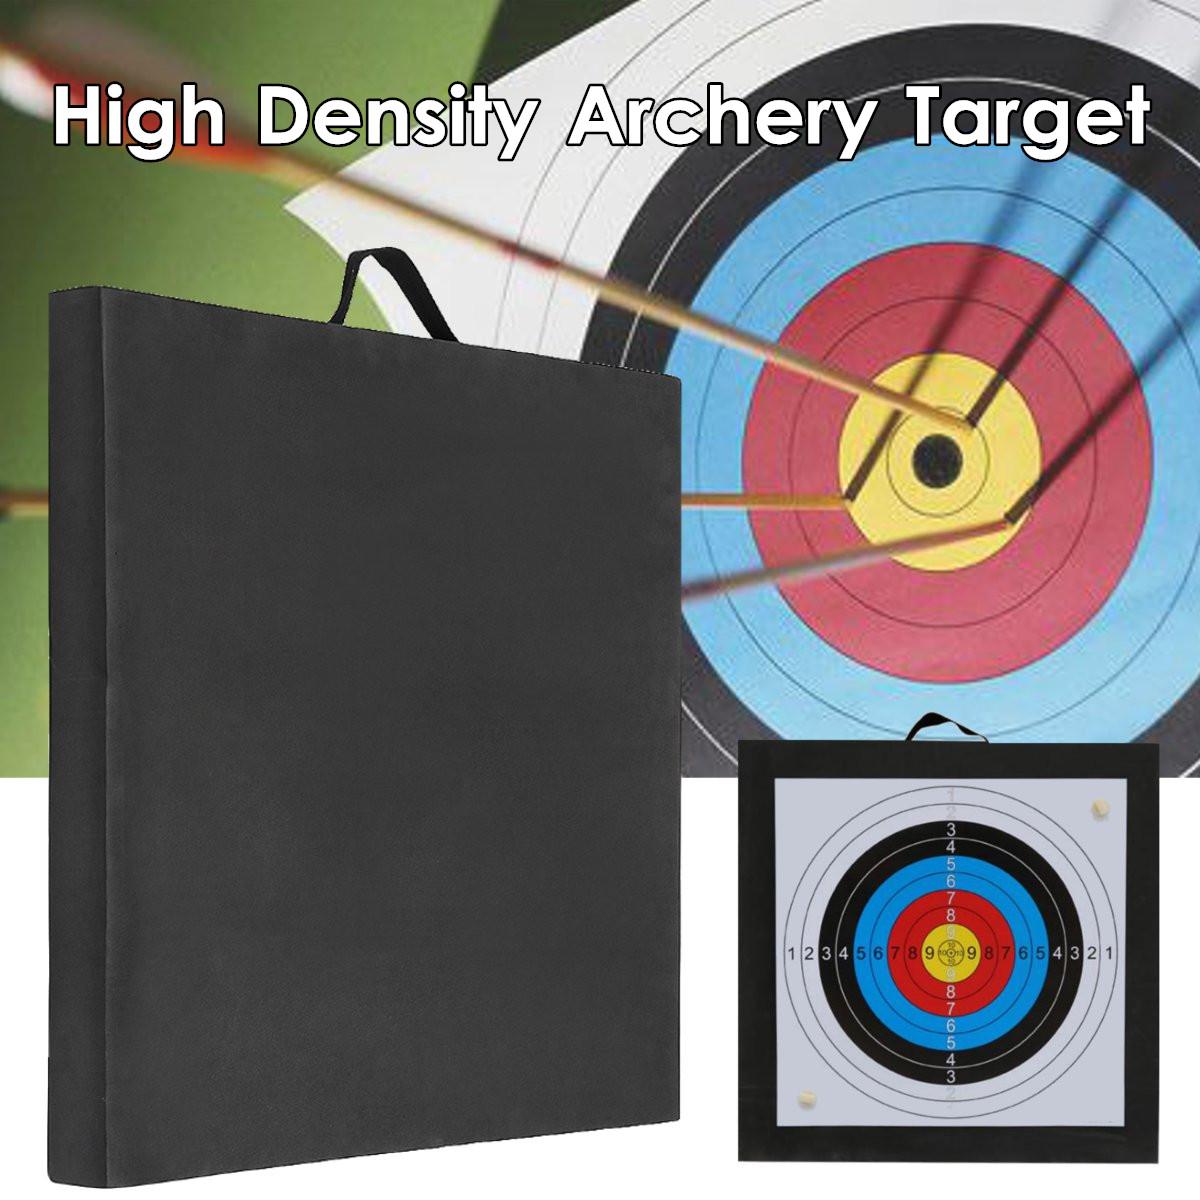 Foam Polystyrene Archery Target Outdoor Sports Hunting